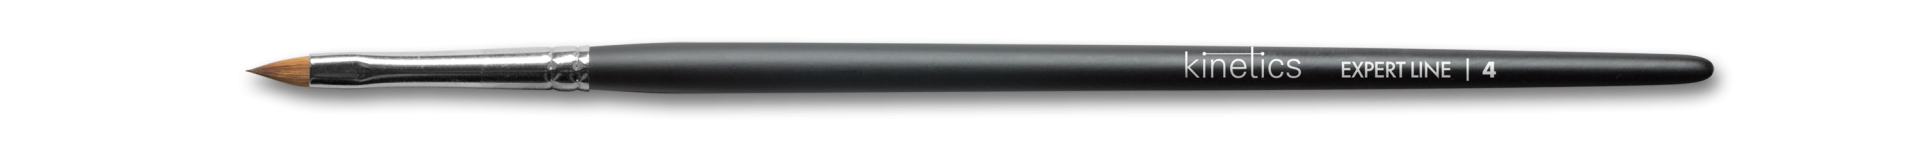 Kinetics Expert Line Universal Brush Size 4